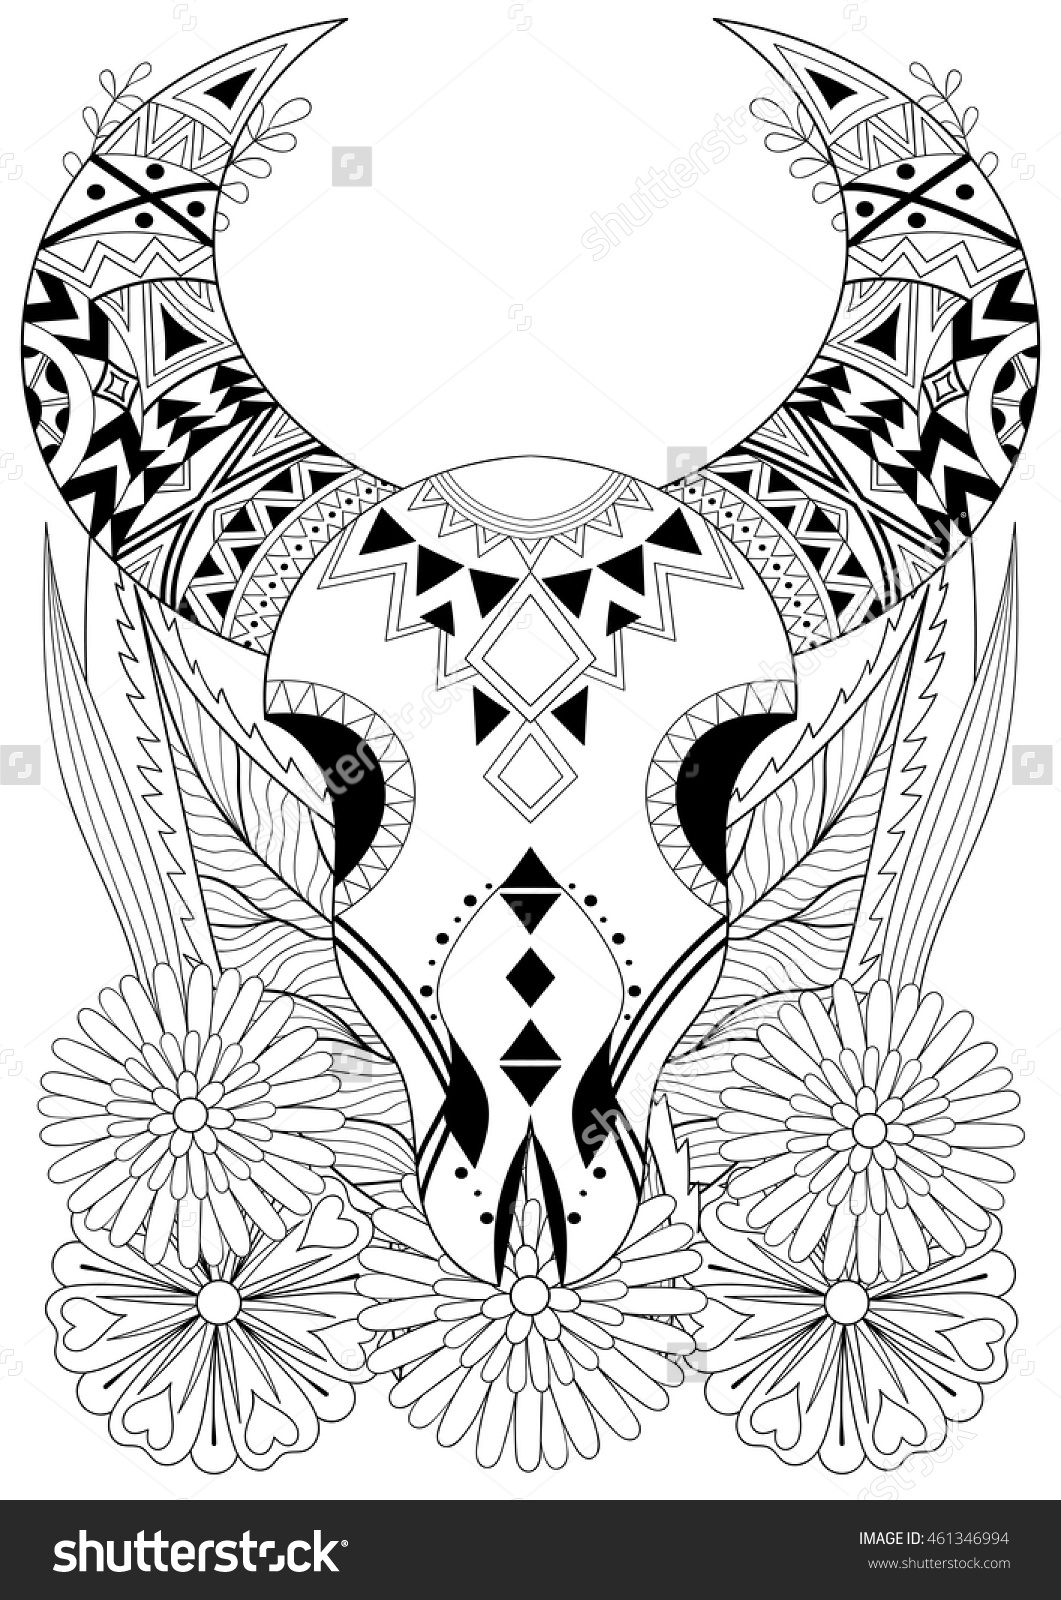 Zentangle Stylized Animal Skull Flowers Hand Stock Vector.